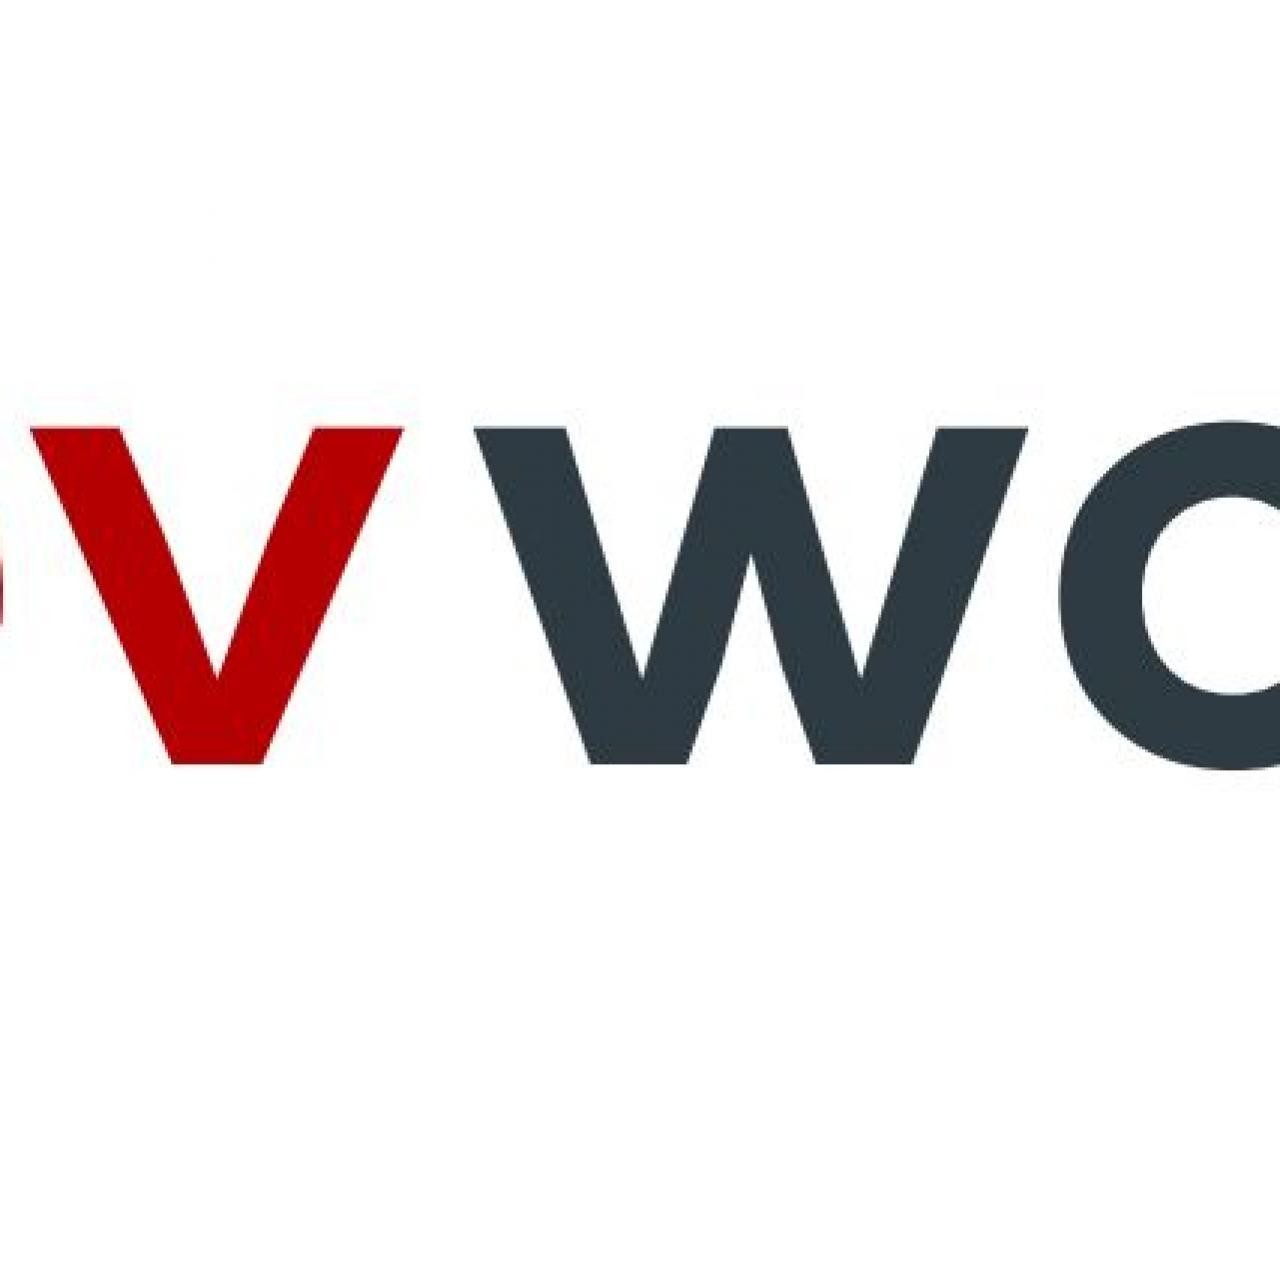 EVworld South – FREE Public Day in Christchurch – Sat 24 November